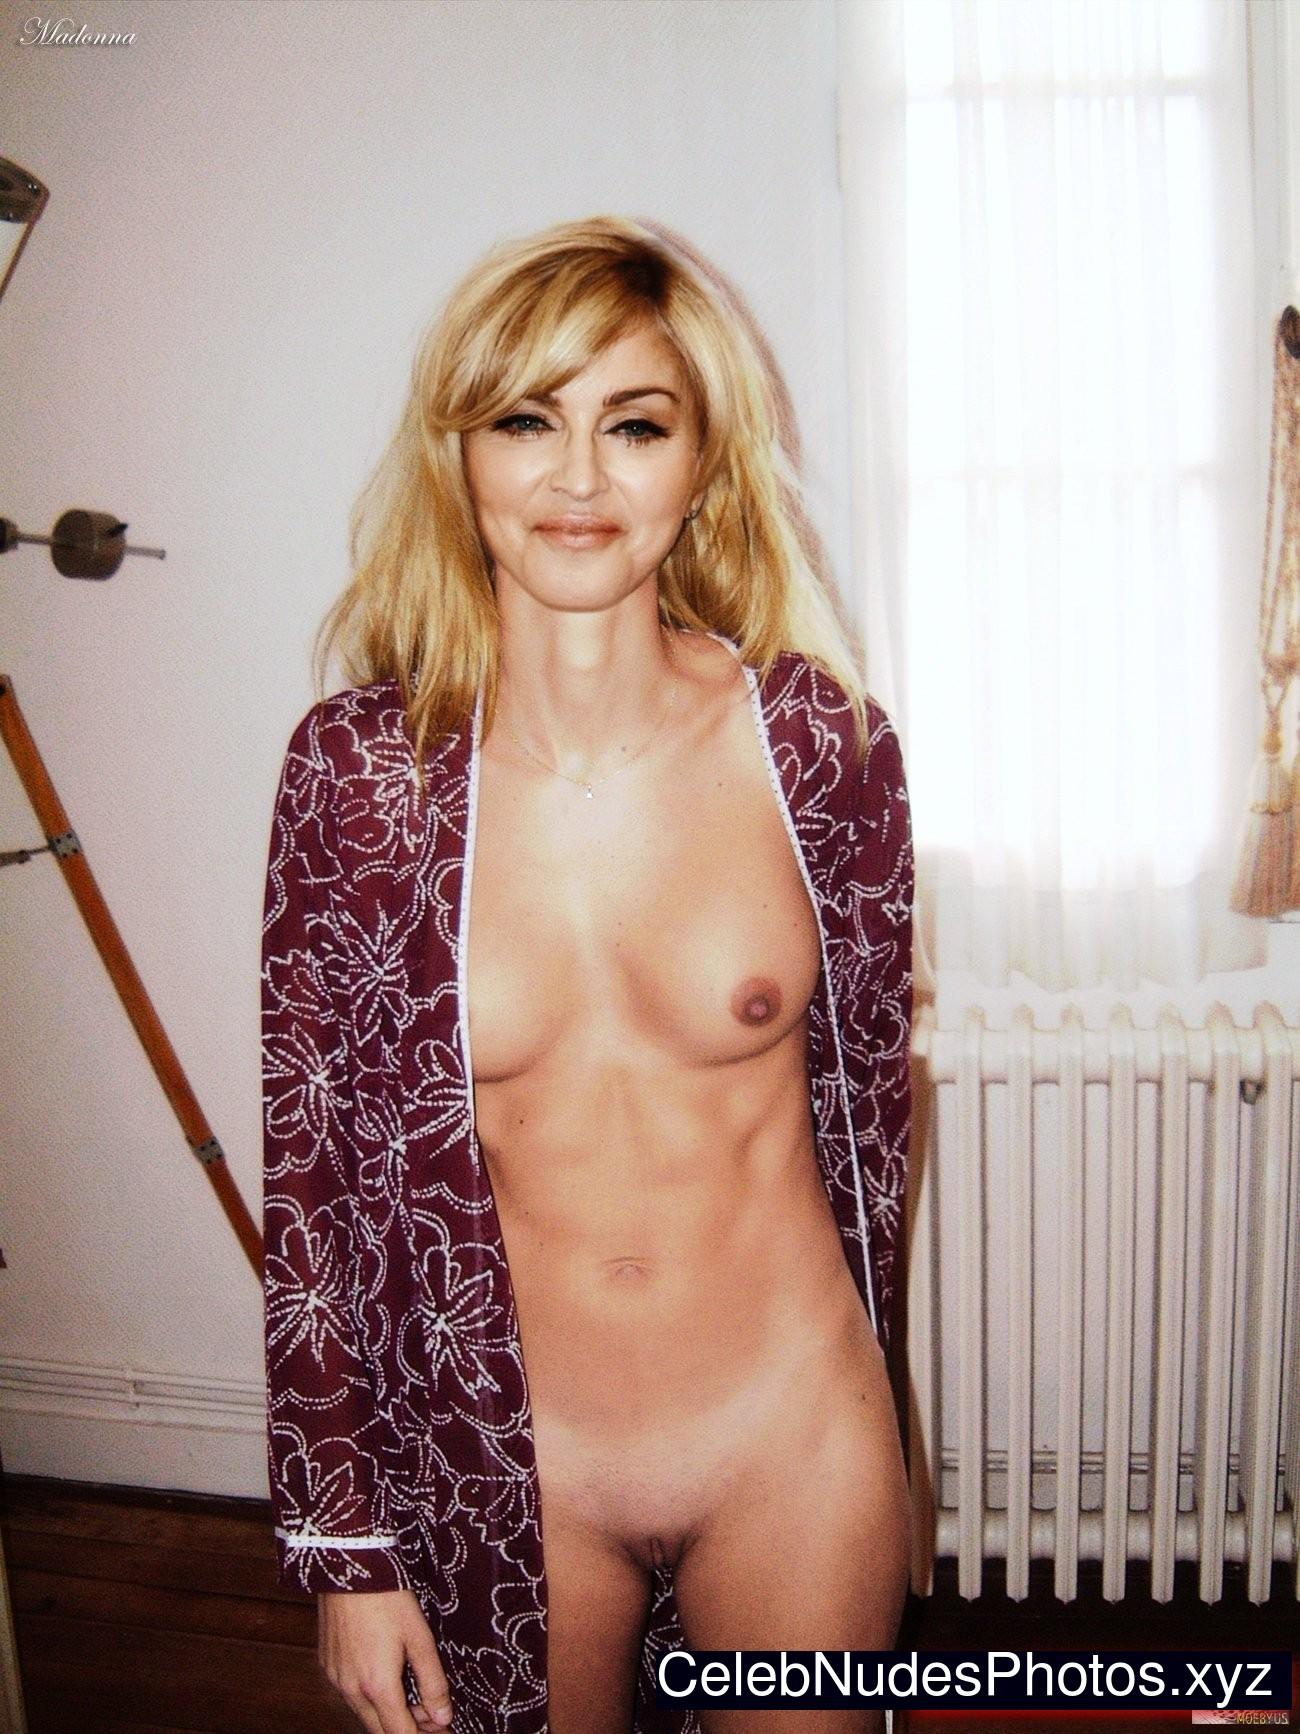 nude celeb pics for free